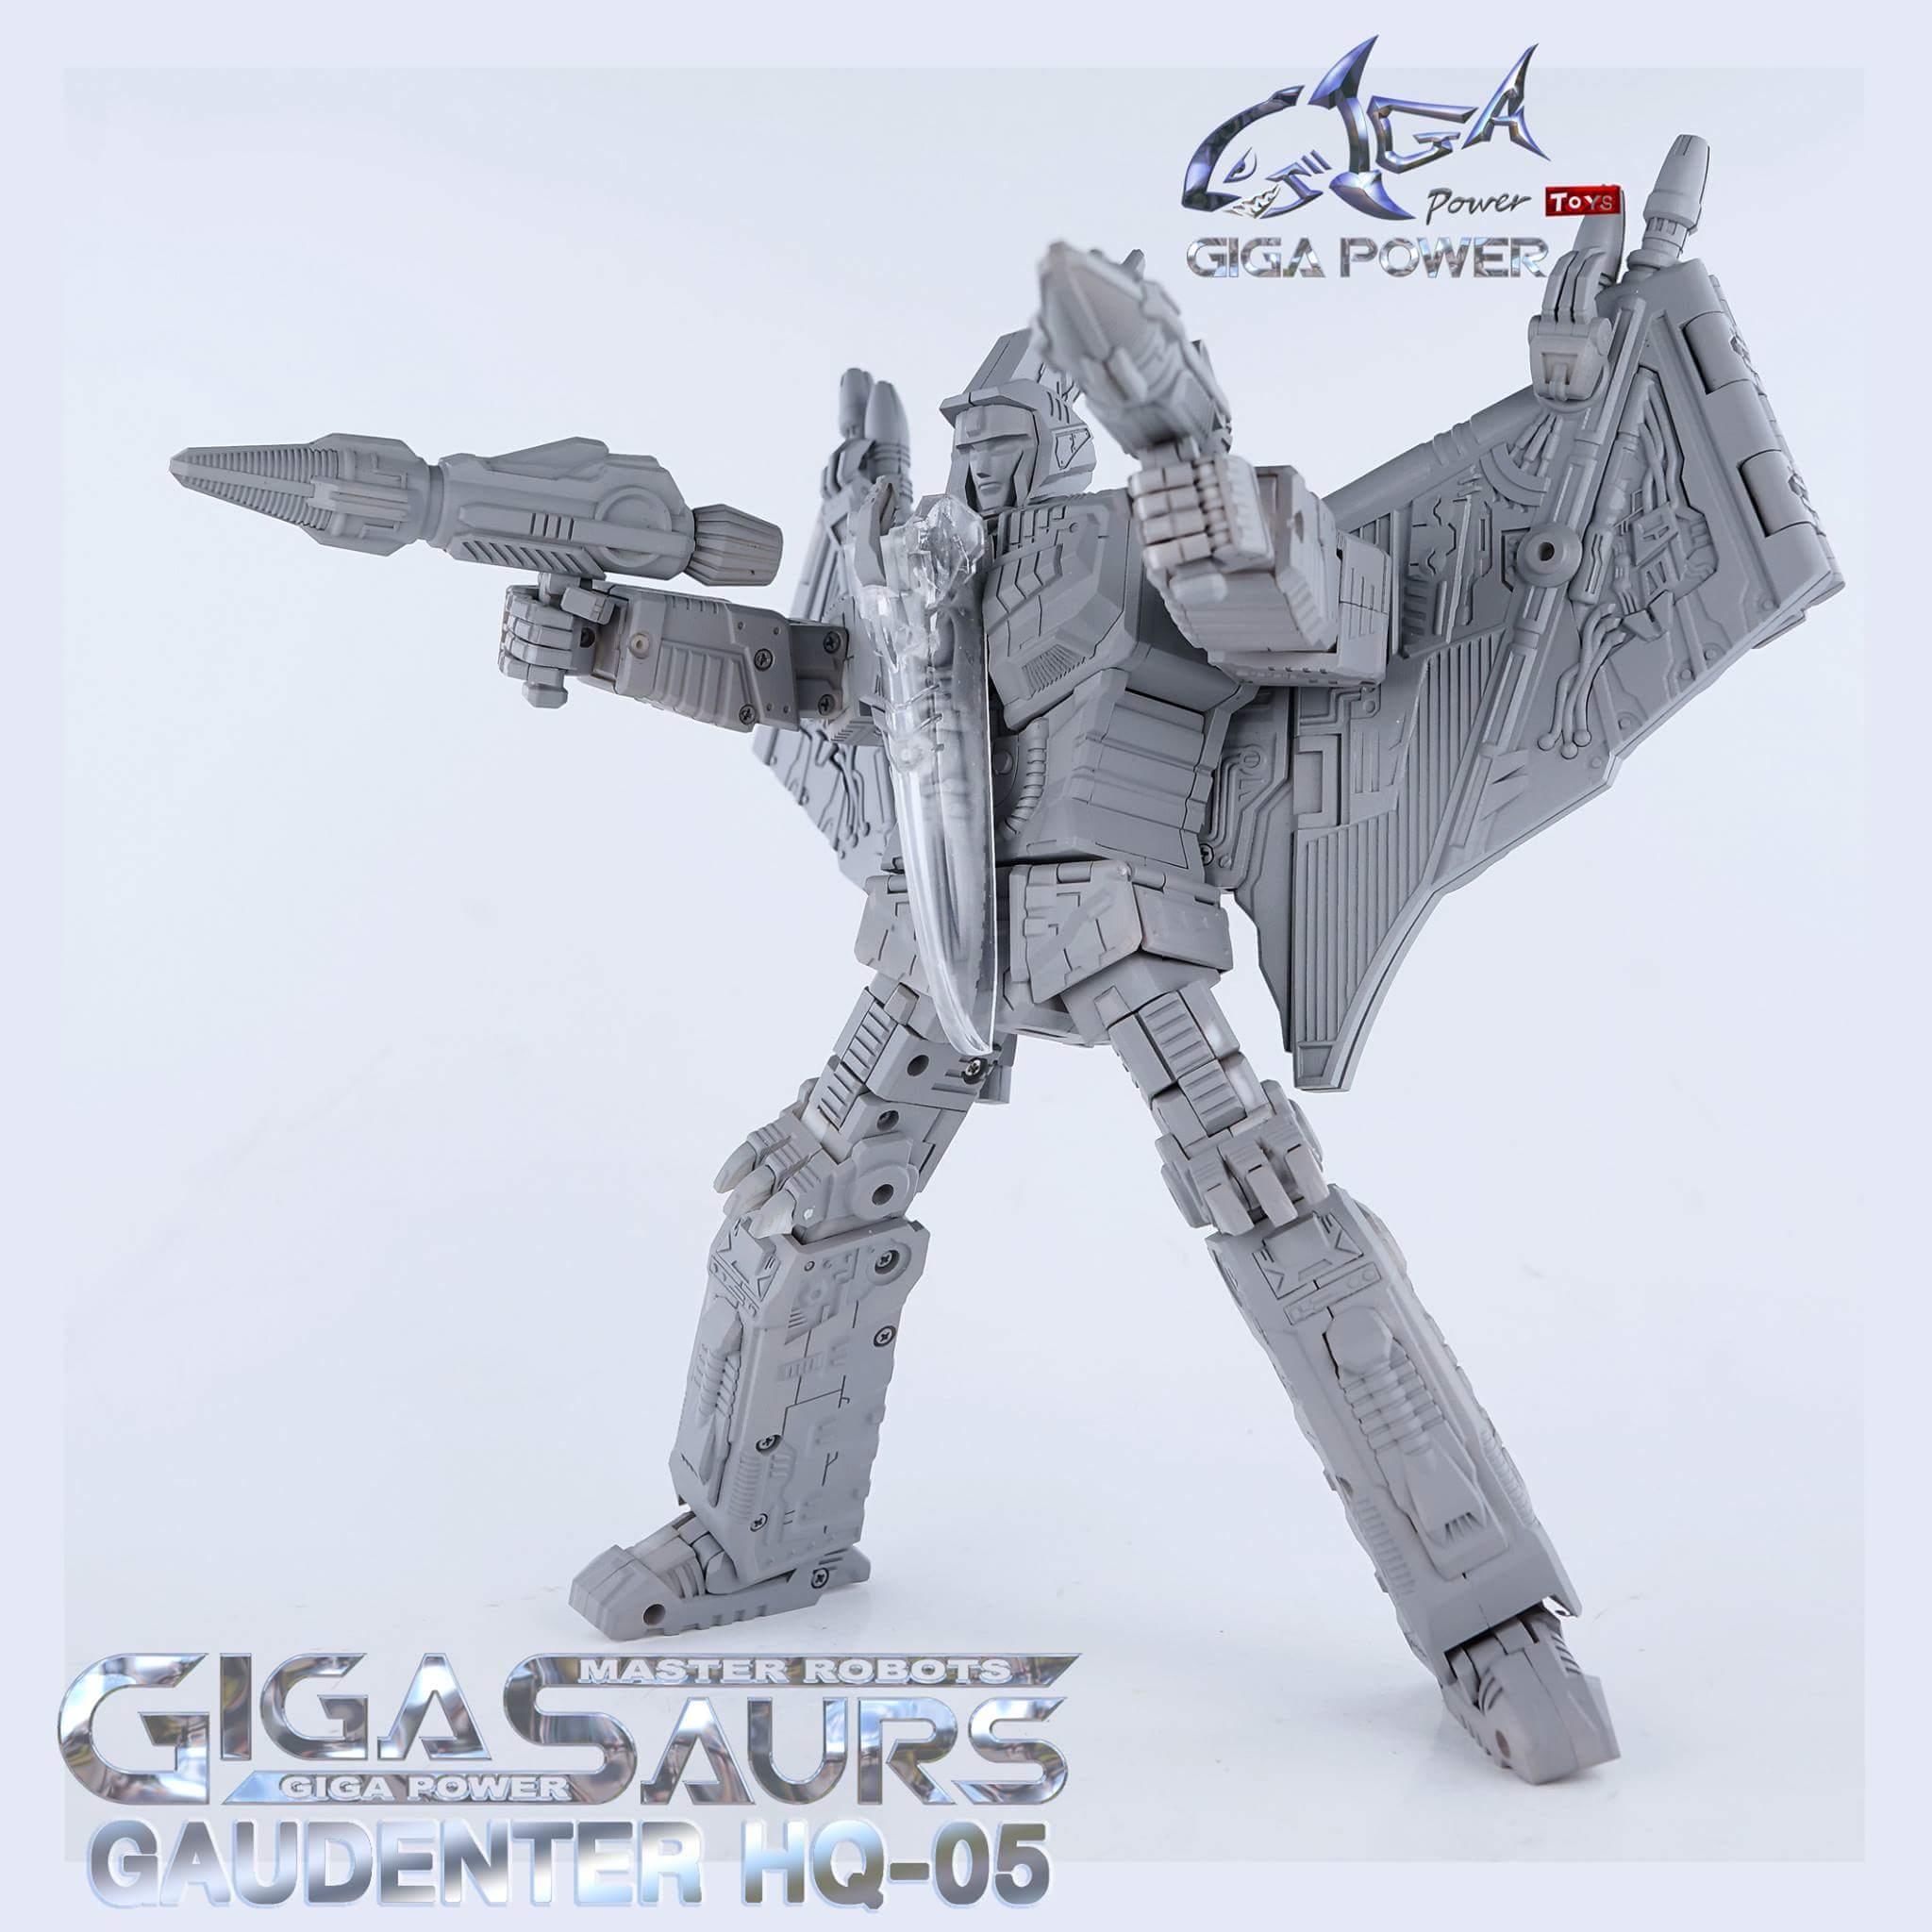 [GigaPower] Produit Tiers - Jouets HQ-01 Superator + HQ-02 Grassor + HQ-03 Guttur + HQ-04 Graviter + HQ-05 Gaudenter - aka Dinobots - Page 4 IA0R6cI1